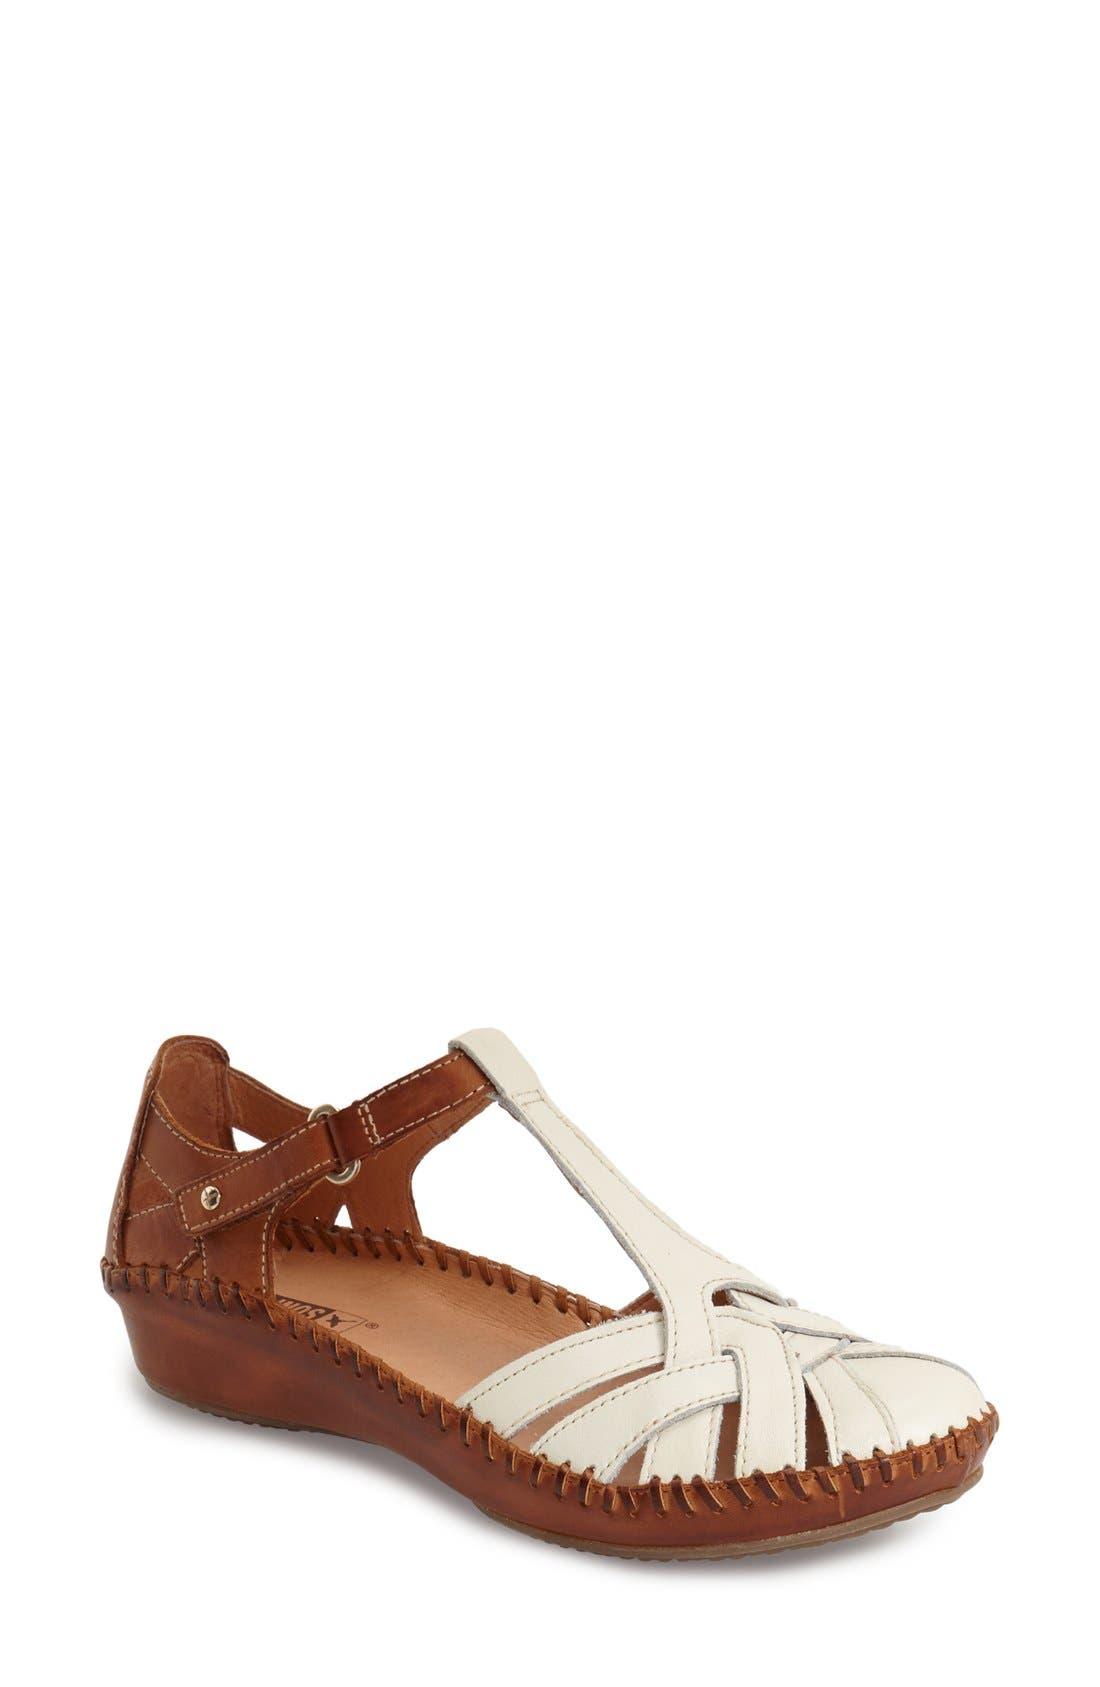 'P. Vallarta 655' T-Strap Sandal, Main, color, 100